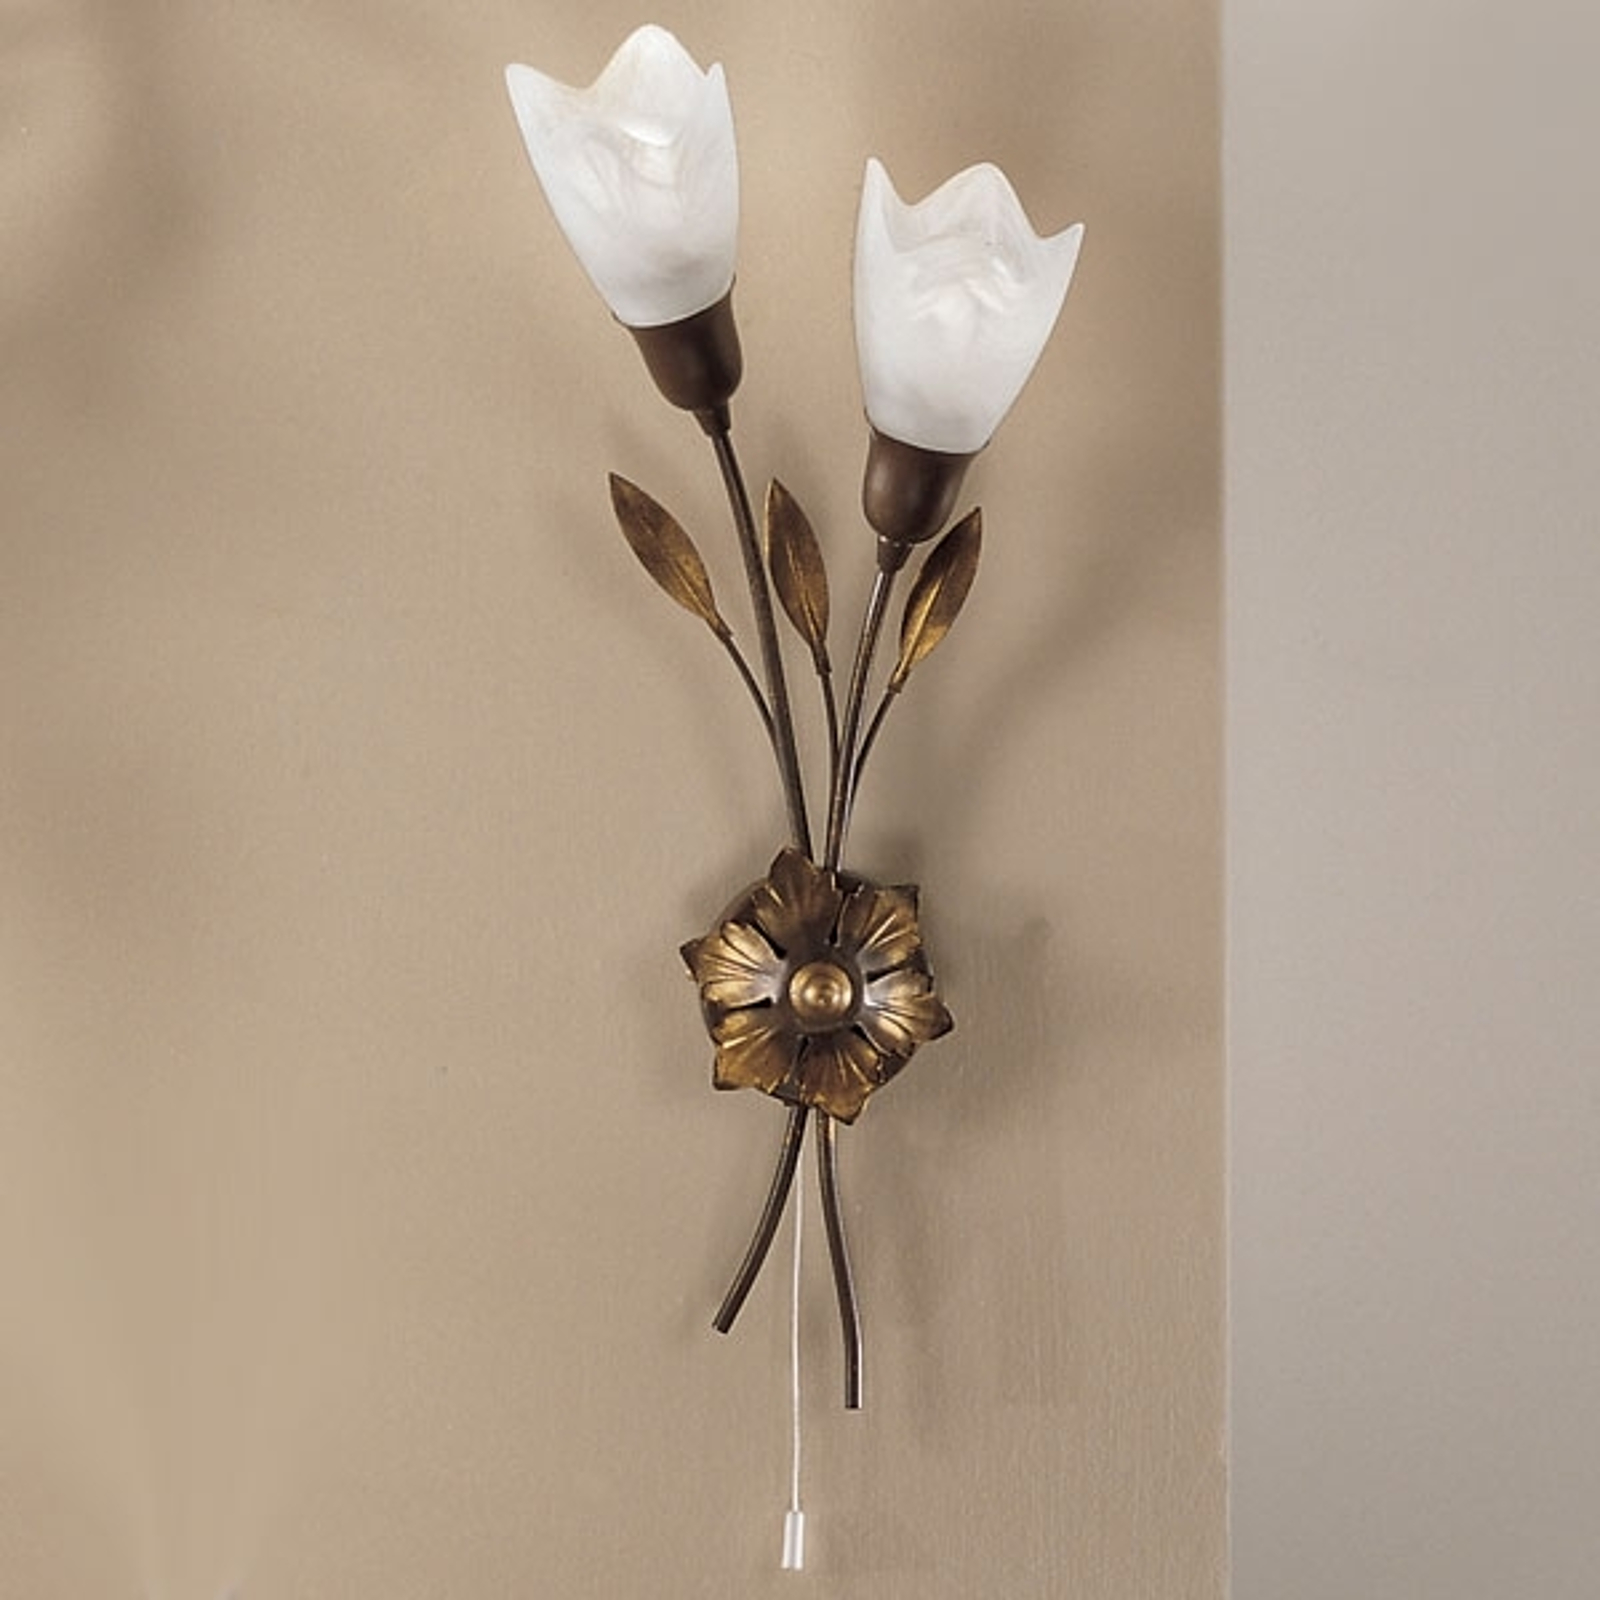 CAMPANA-vegglampe lang blomst venstre